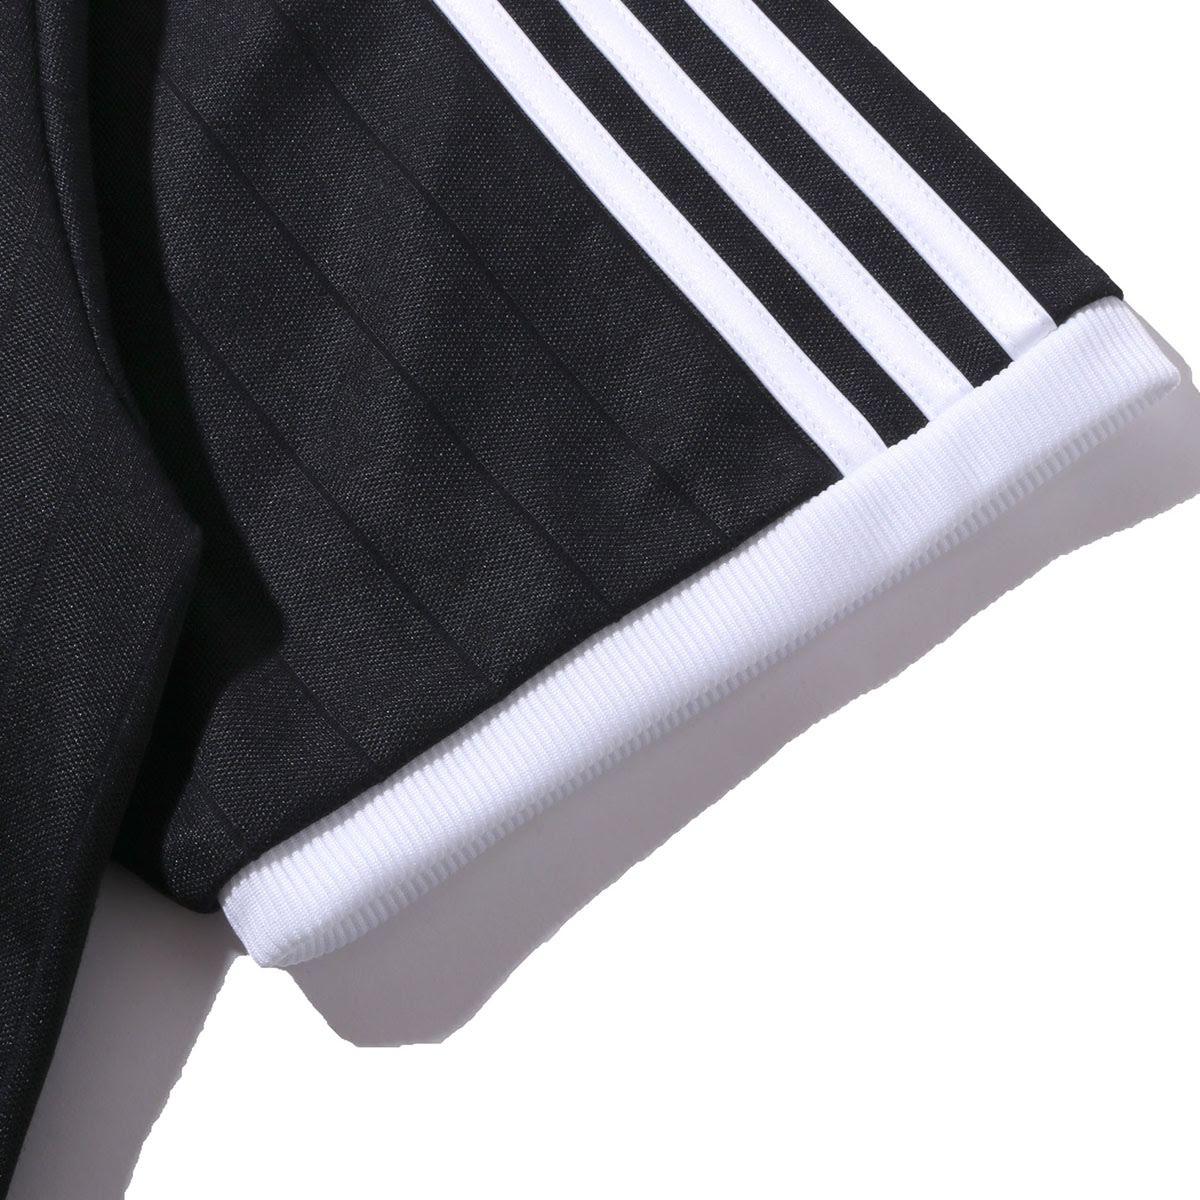 7dae383a75 ... adidas Originals BASEBALL TEE (BLACK/WHITE) (Adidas originals baseball  tea) ...